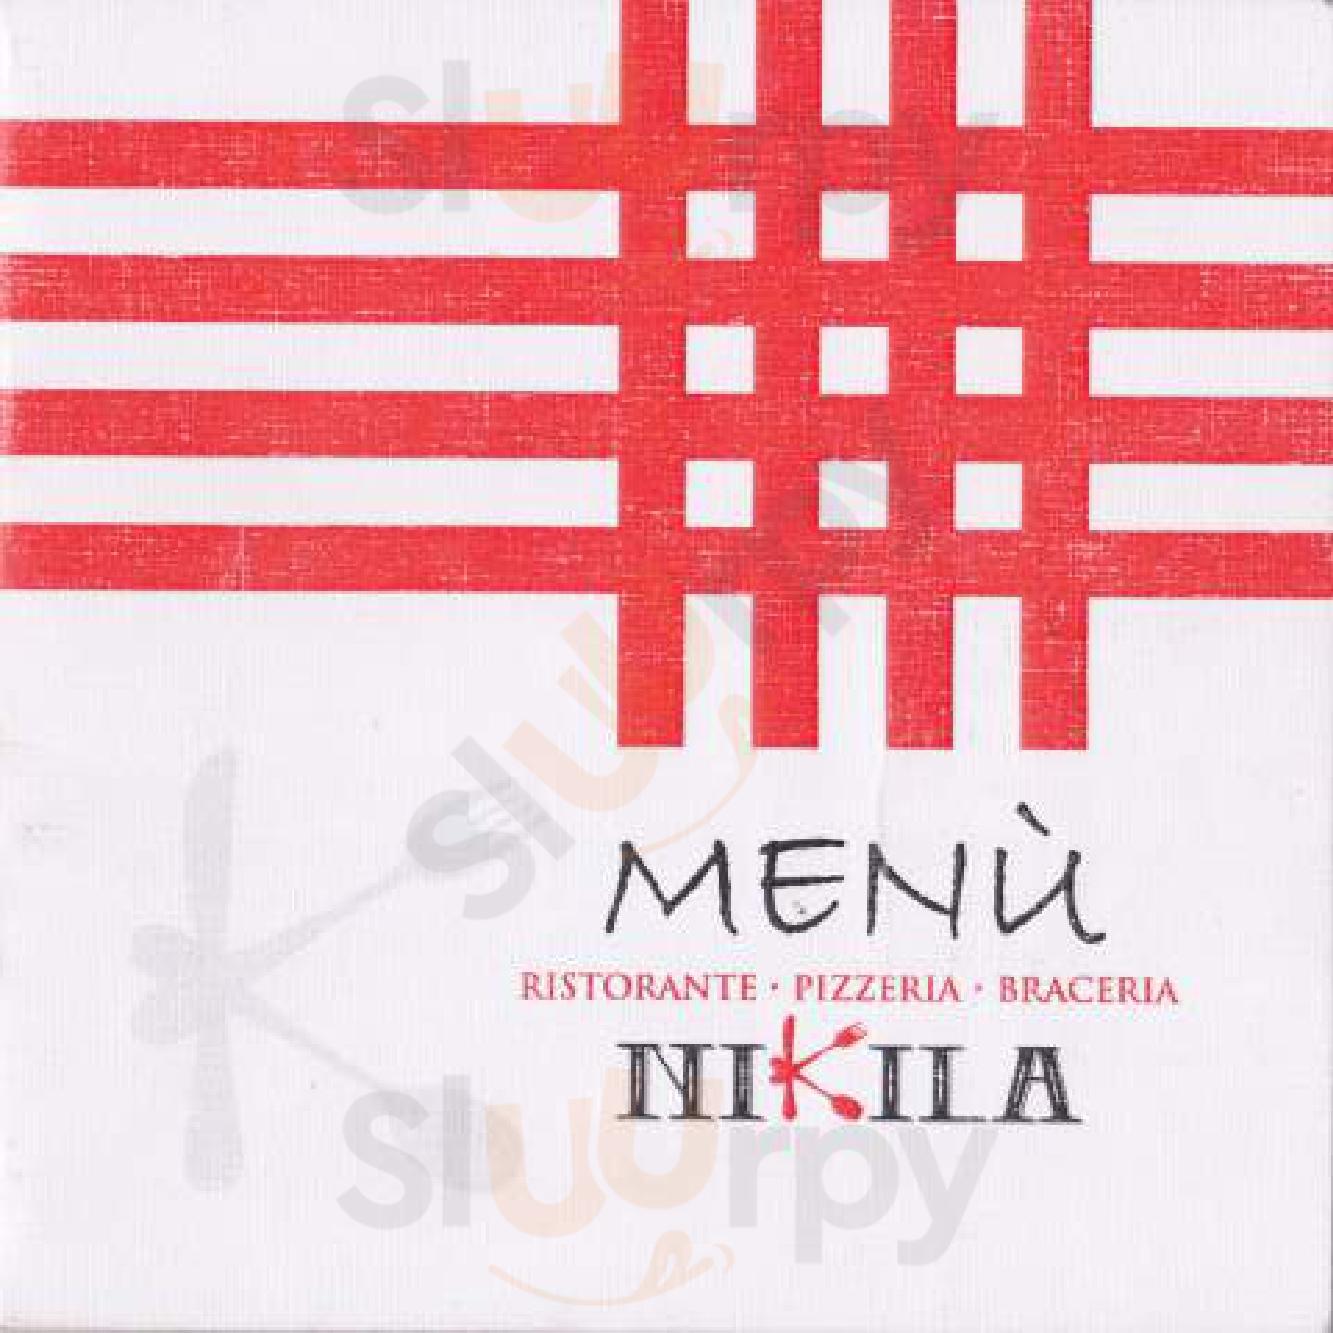 Nikila Ristorante Pizzeria Bracieria Benevento menù 1 pagina